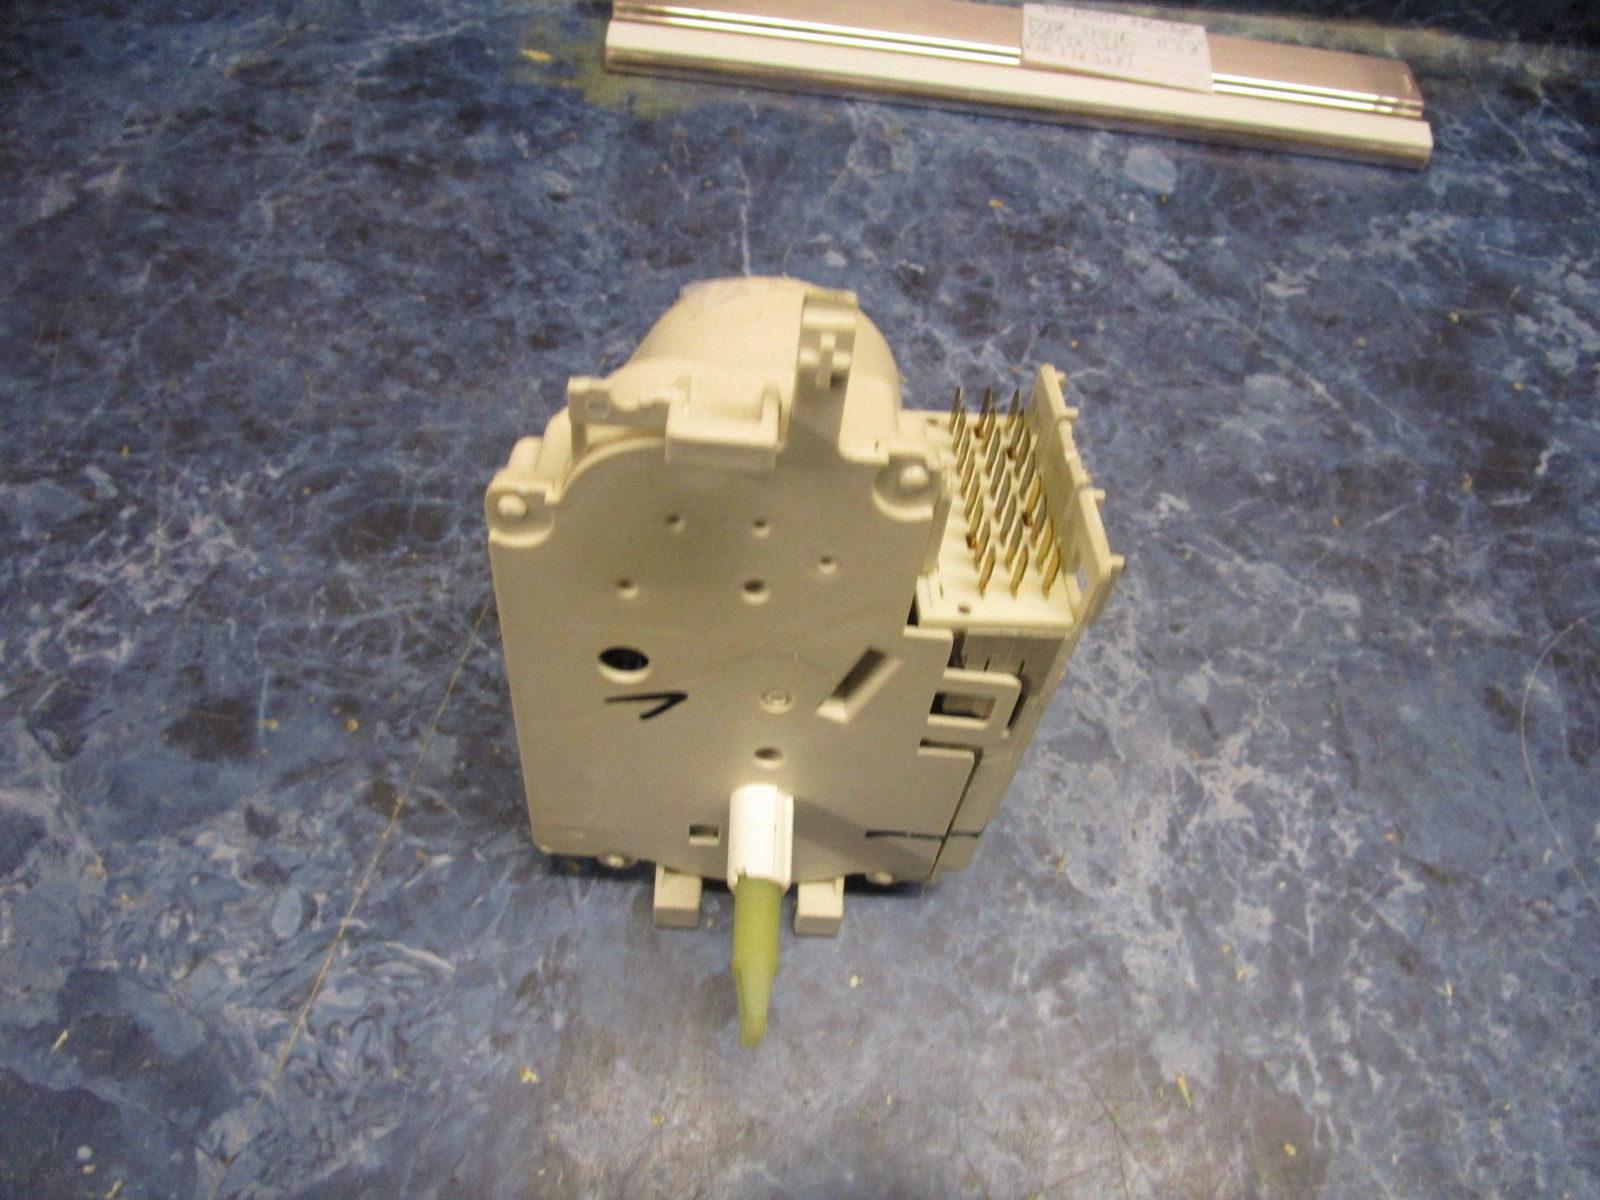 Appliance Repair Parts Appliance Repair Parts Amana Washer